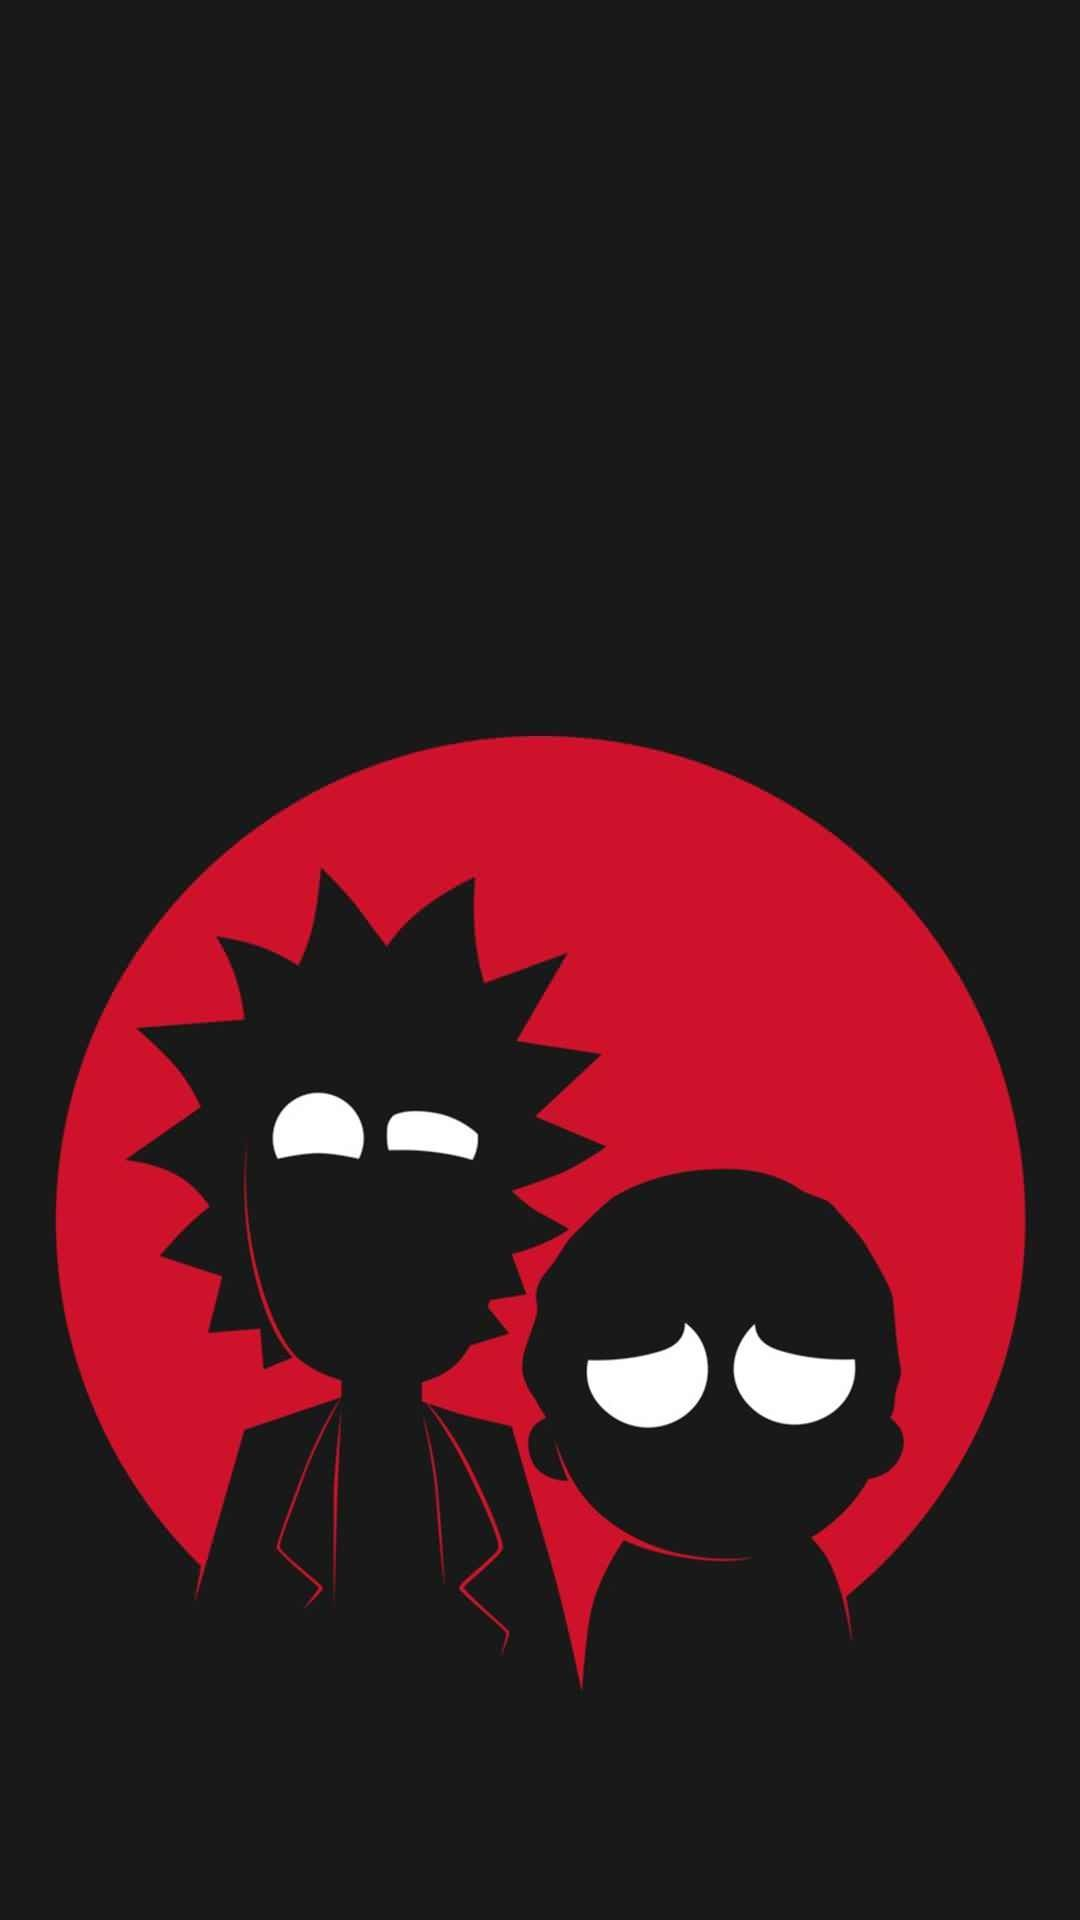 Rick And Morty Wallpapers Pesquisa Google Com Imagens